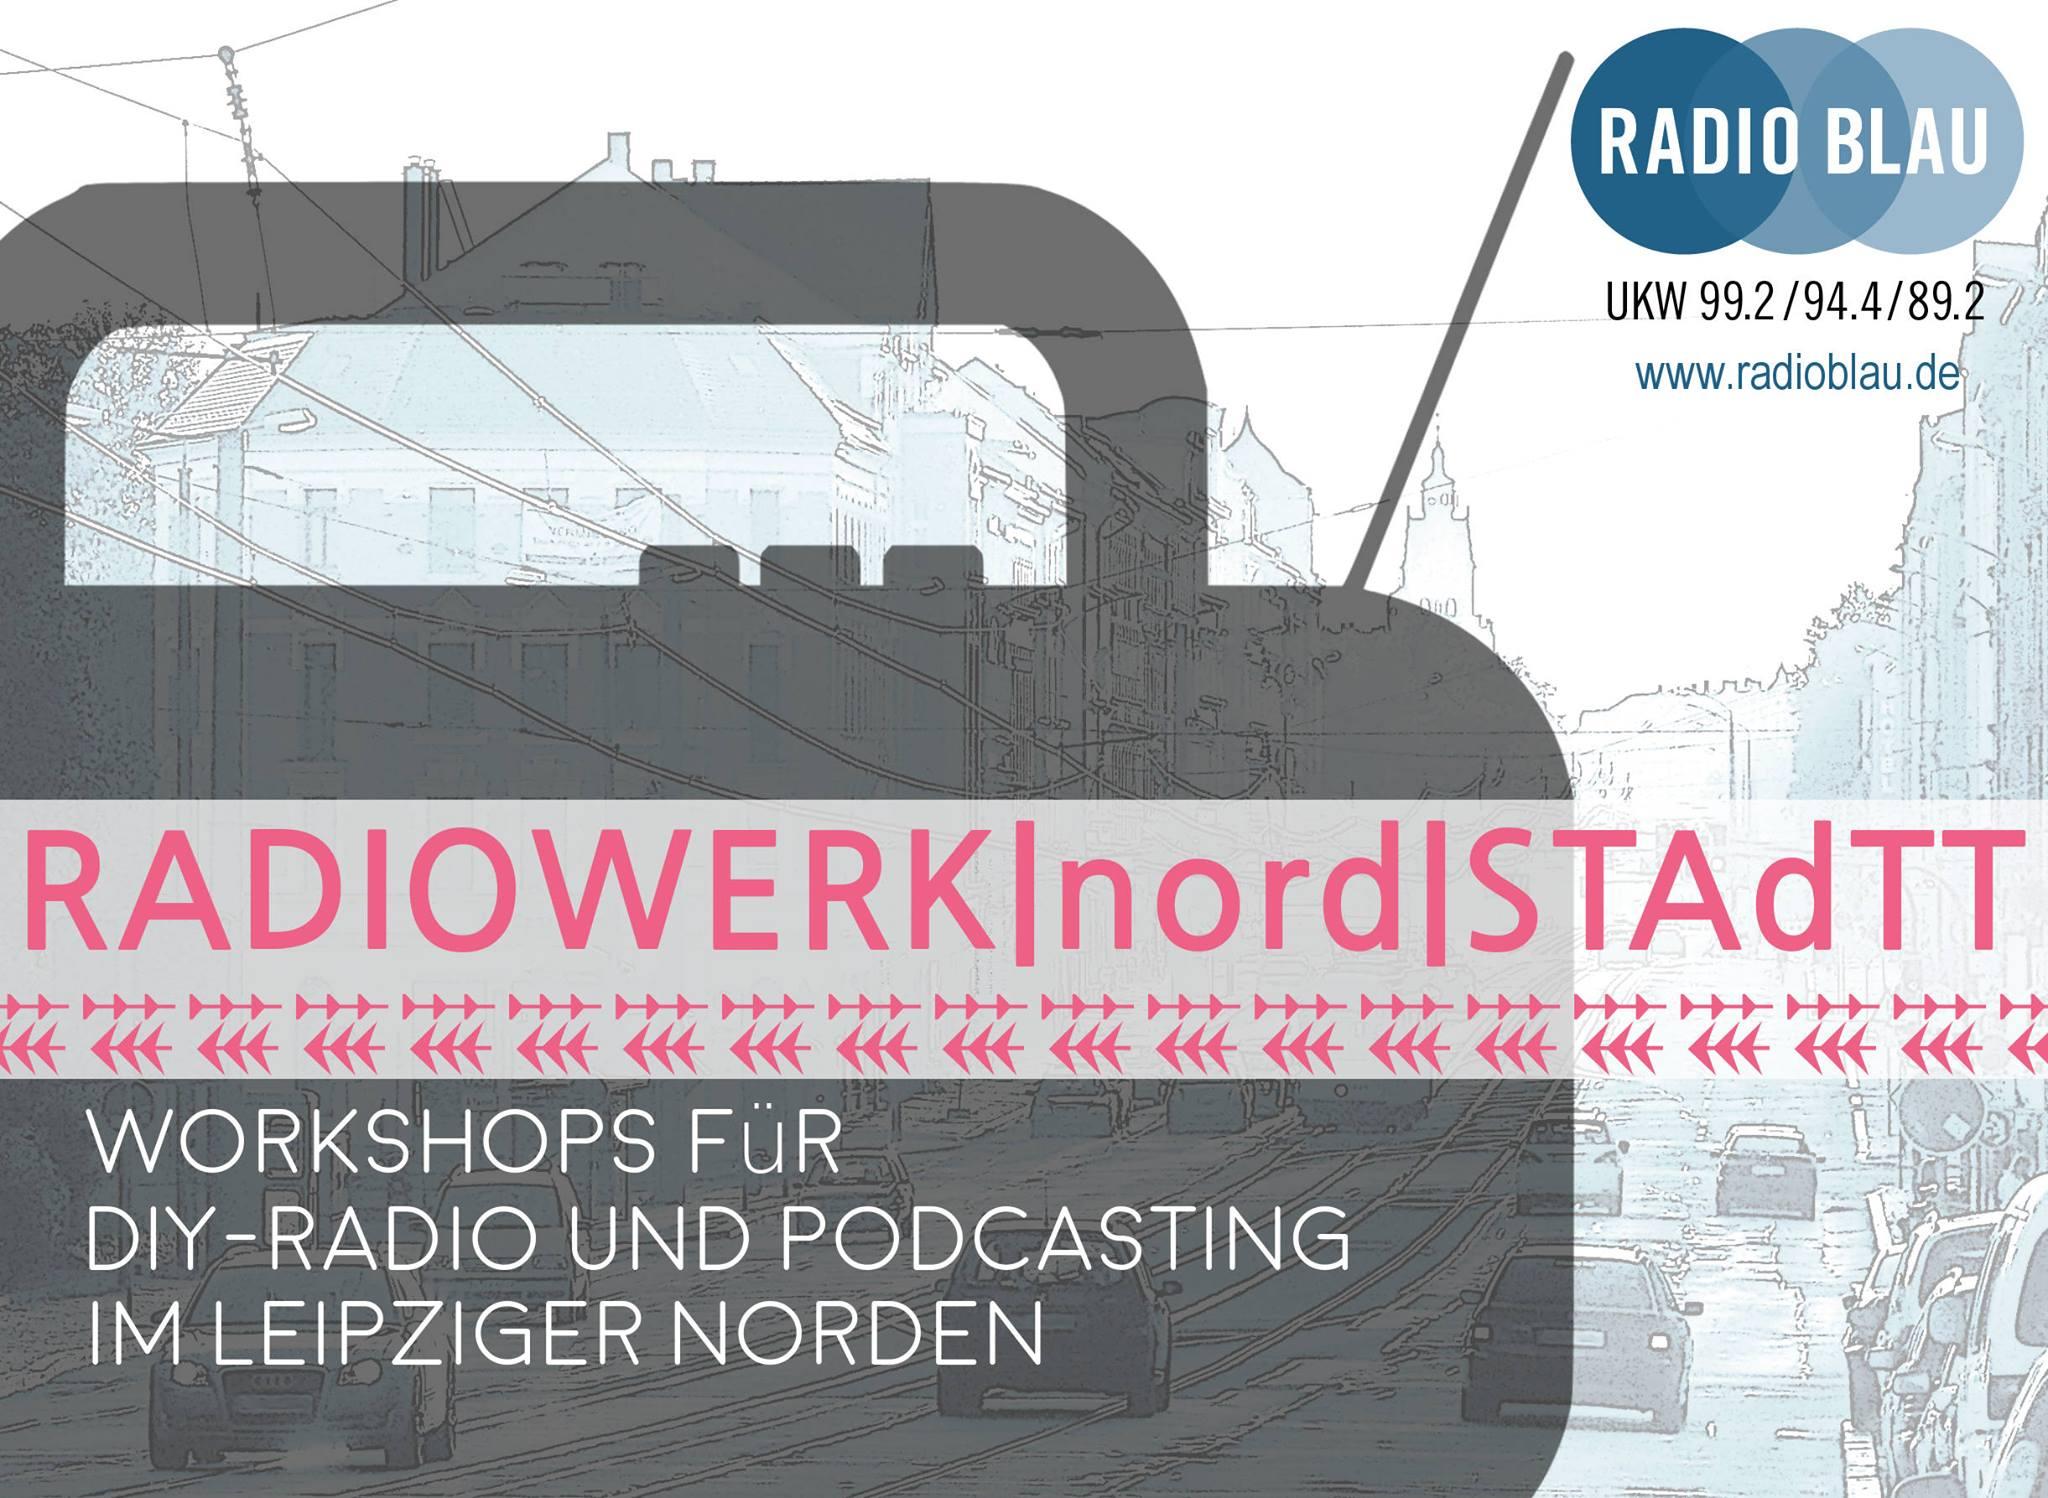 RADIOWERKnordSTAdTT - offene Radiowerkstatt